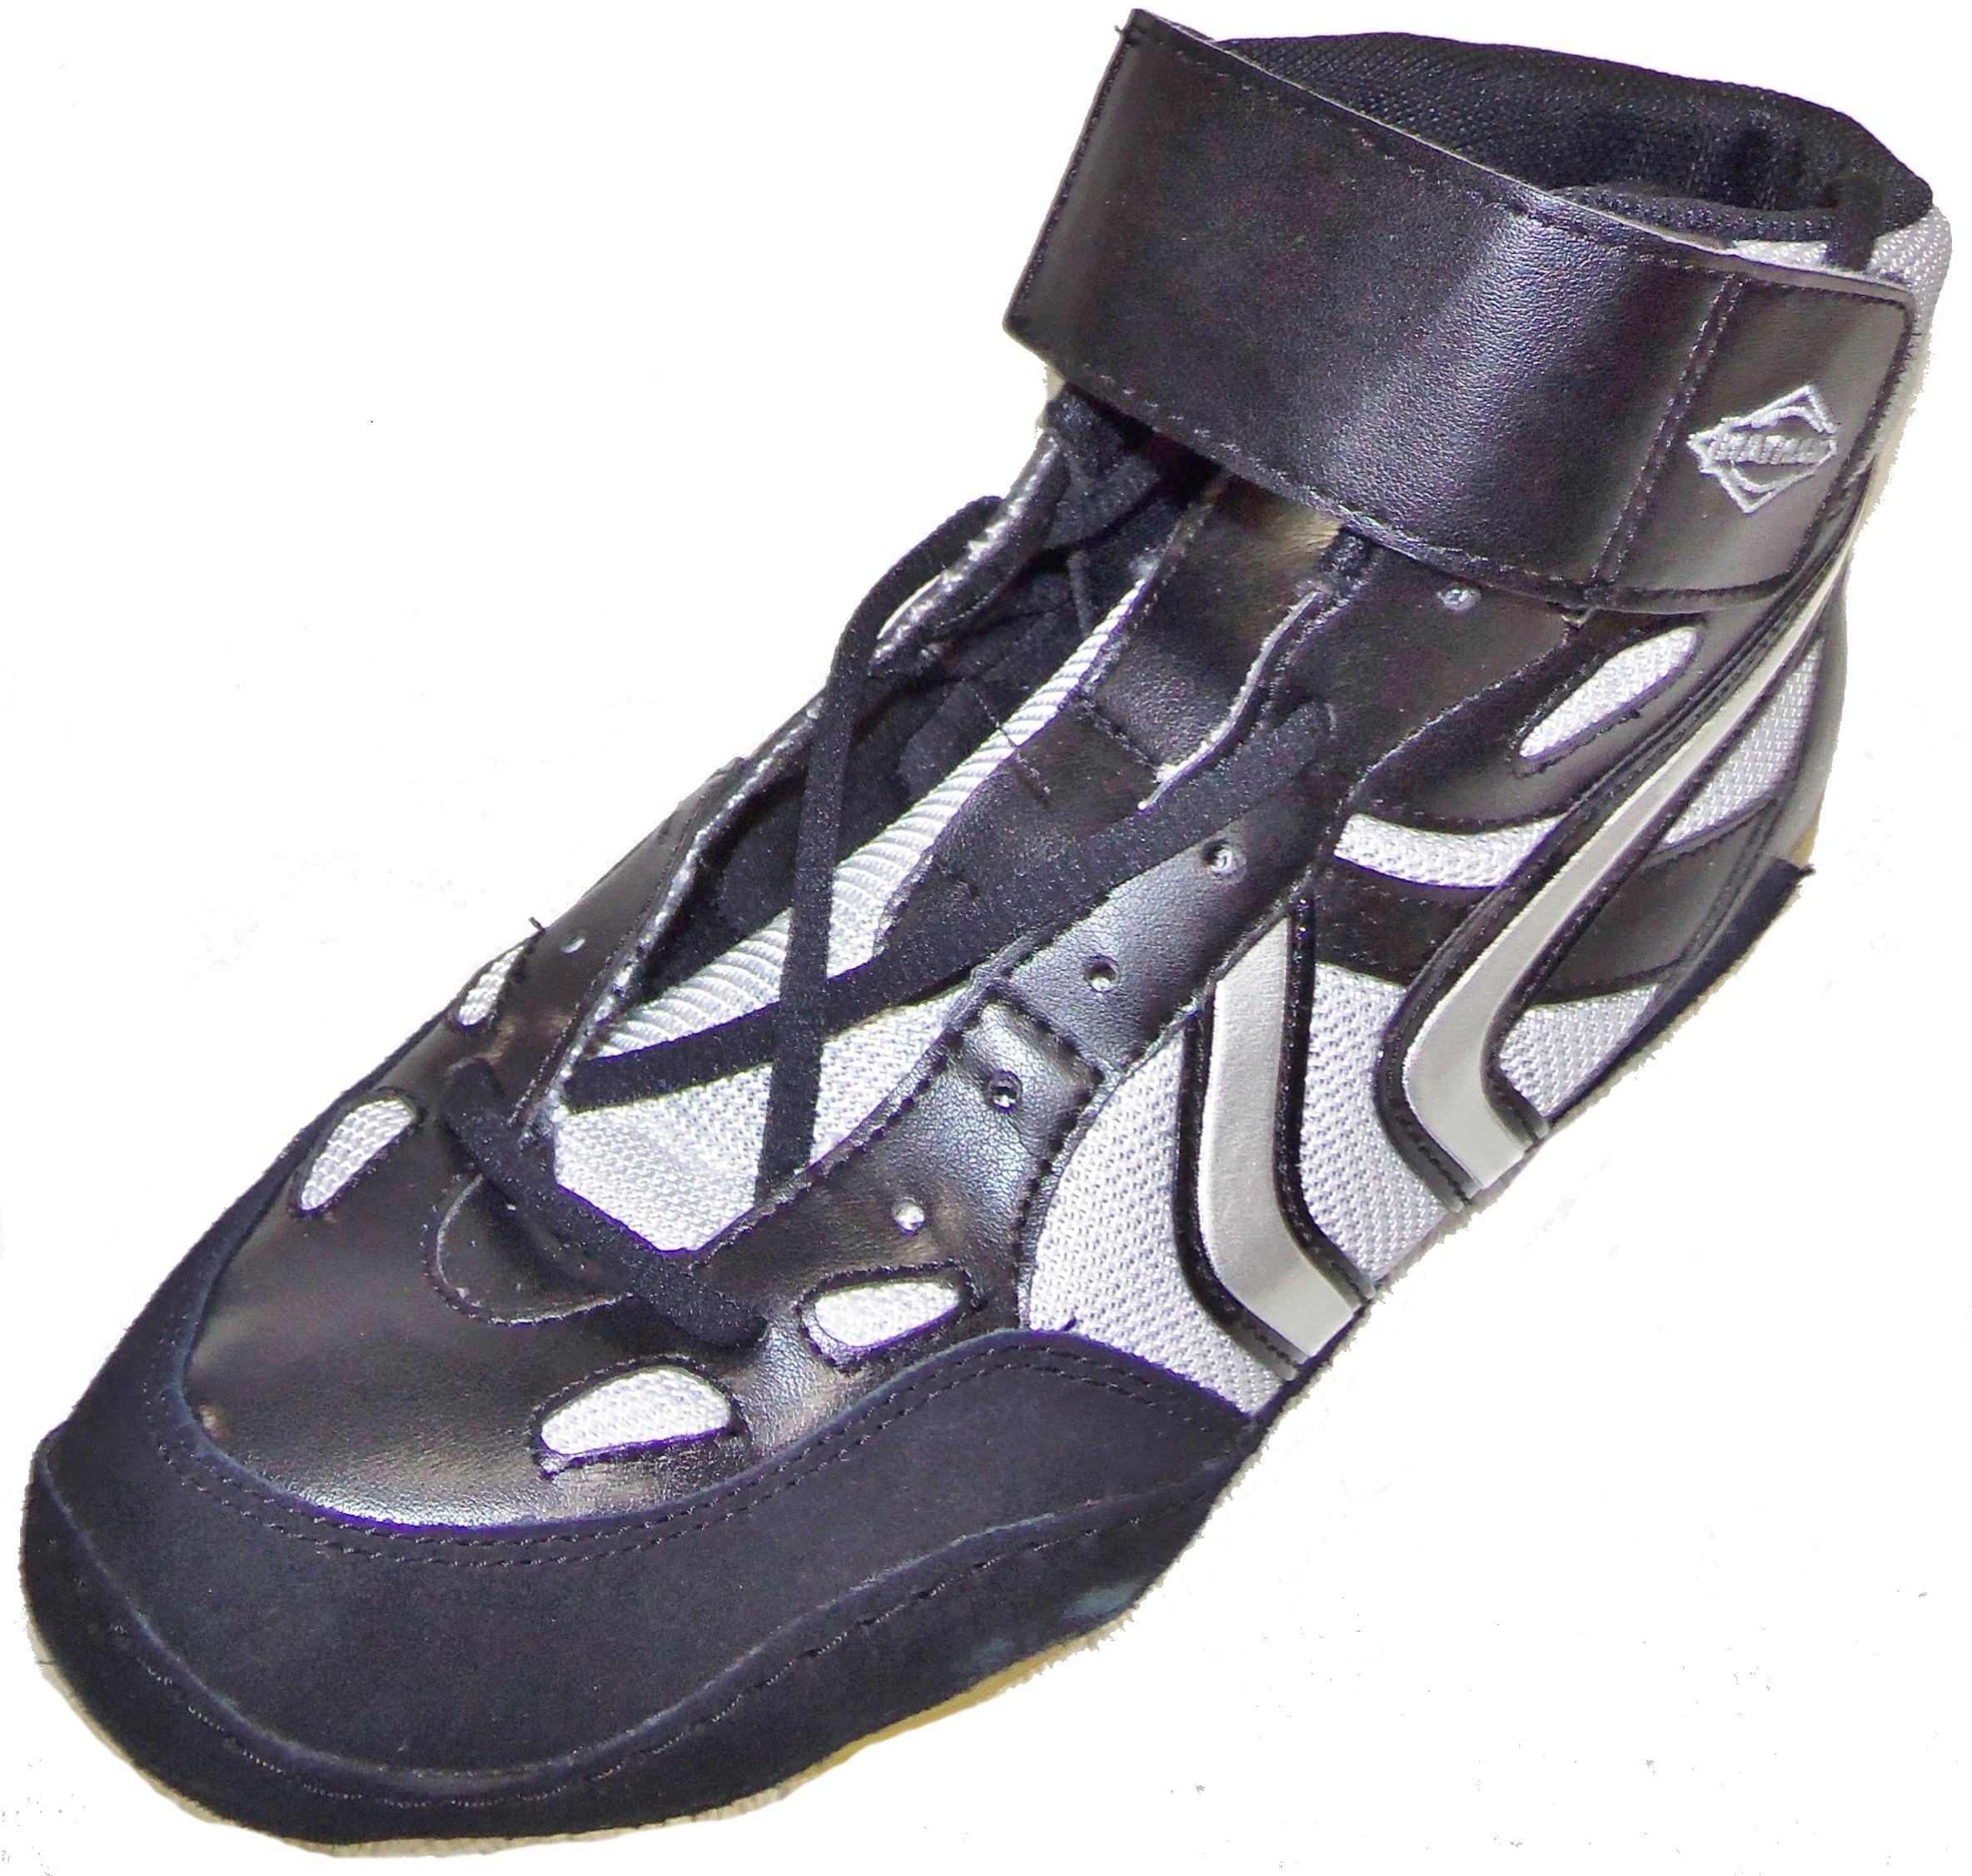 Matman Ultra G5 Revenge Adult Wrestling Shoes Black Silver S040 (9.5)